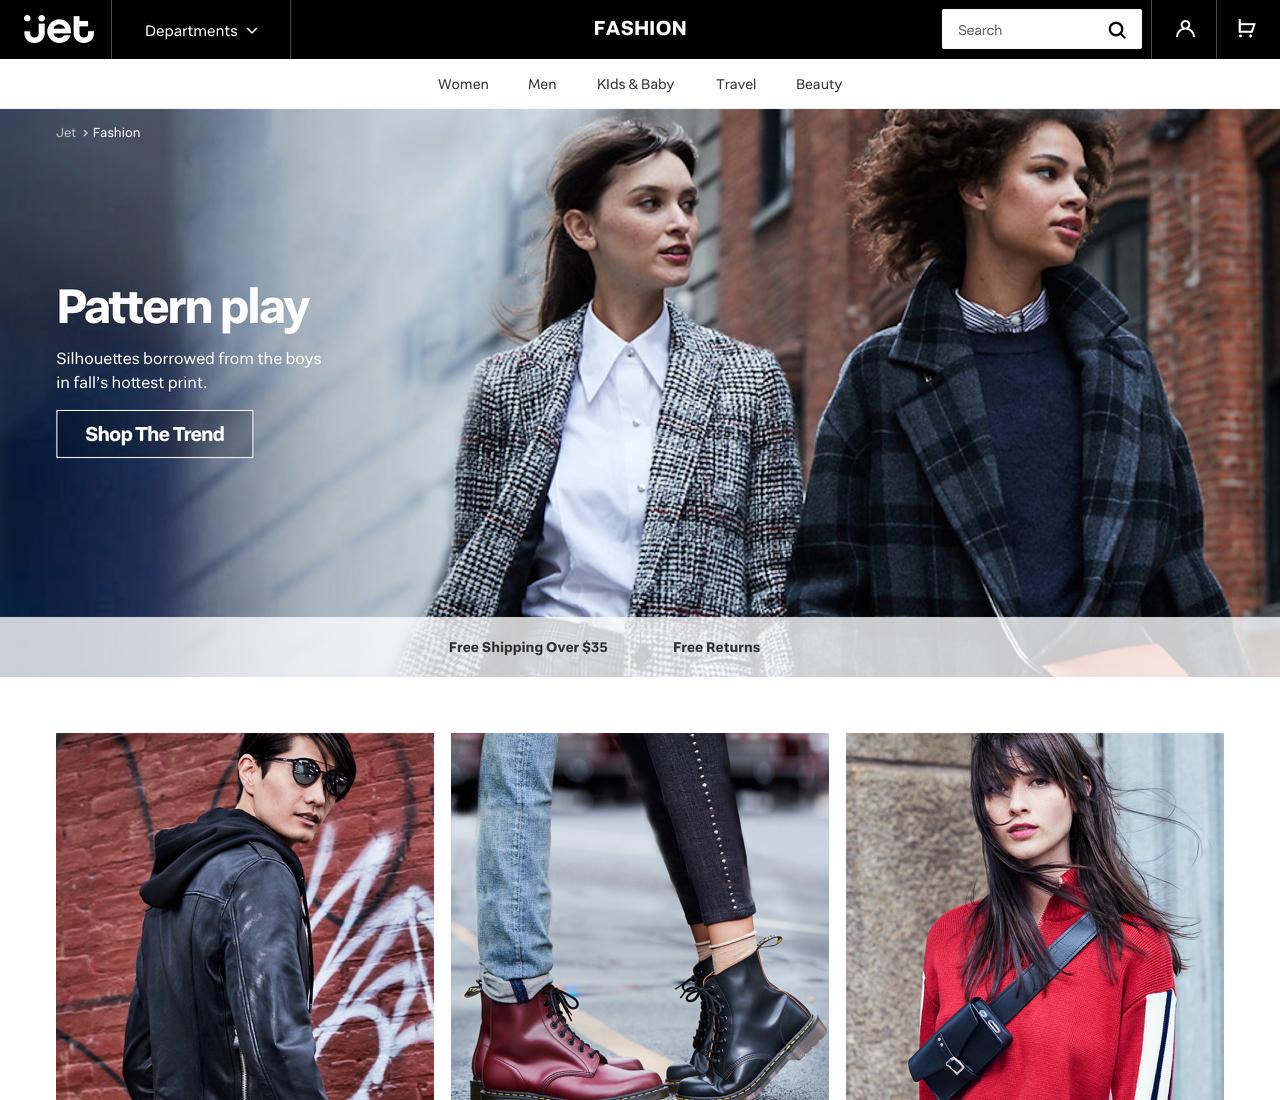 Jet.com's new fashion landing page.